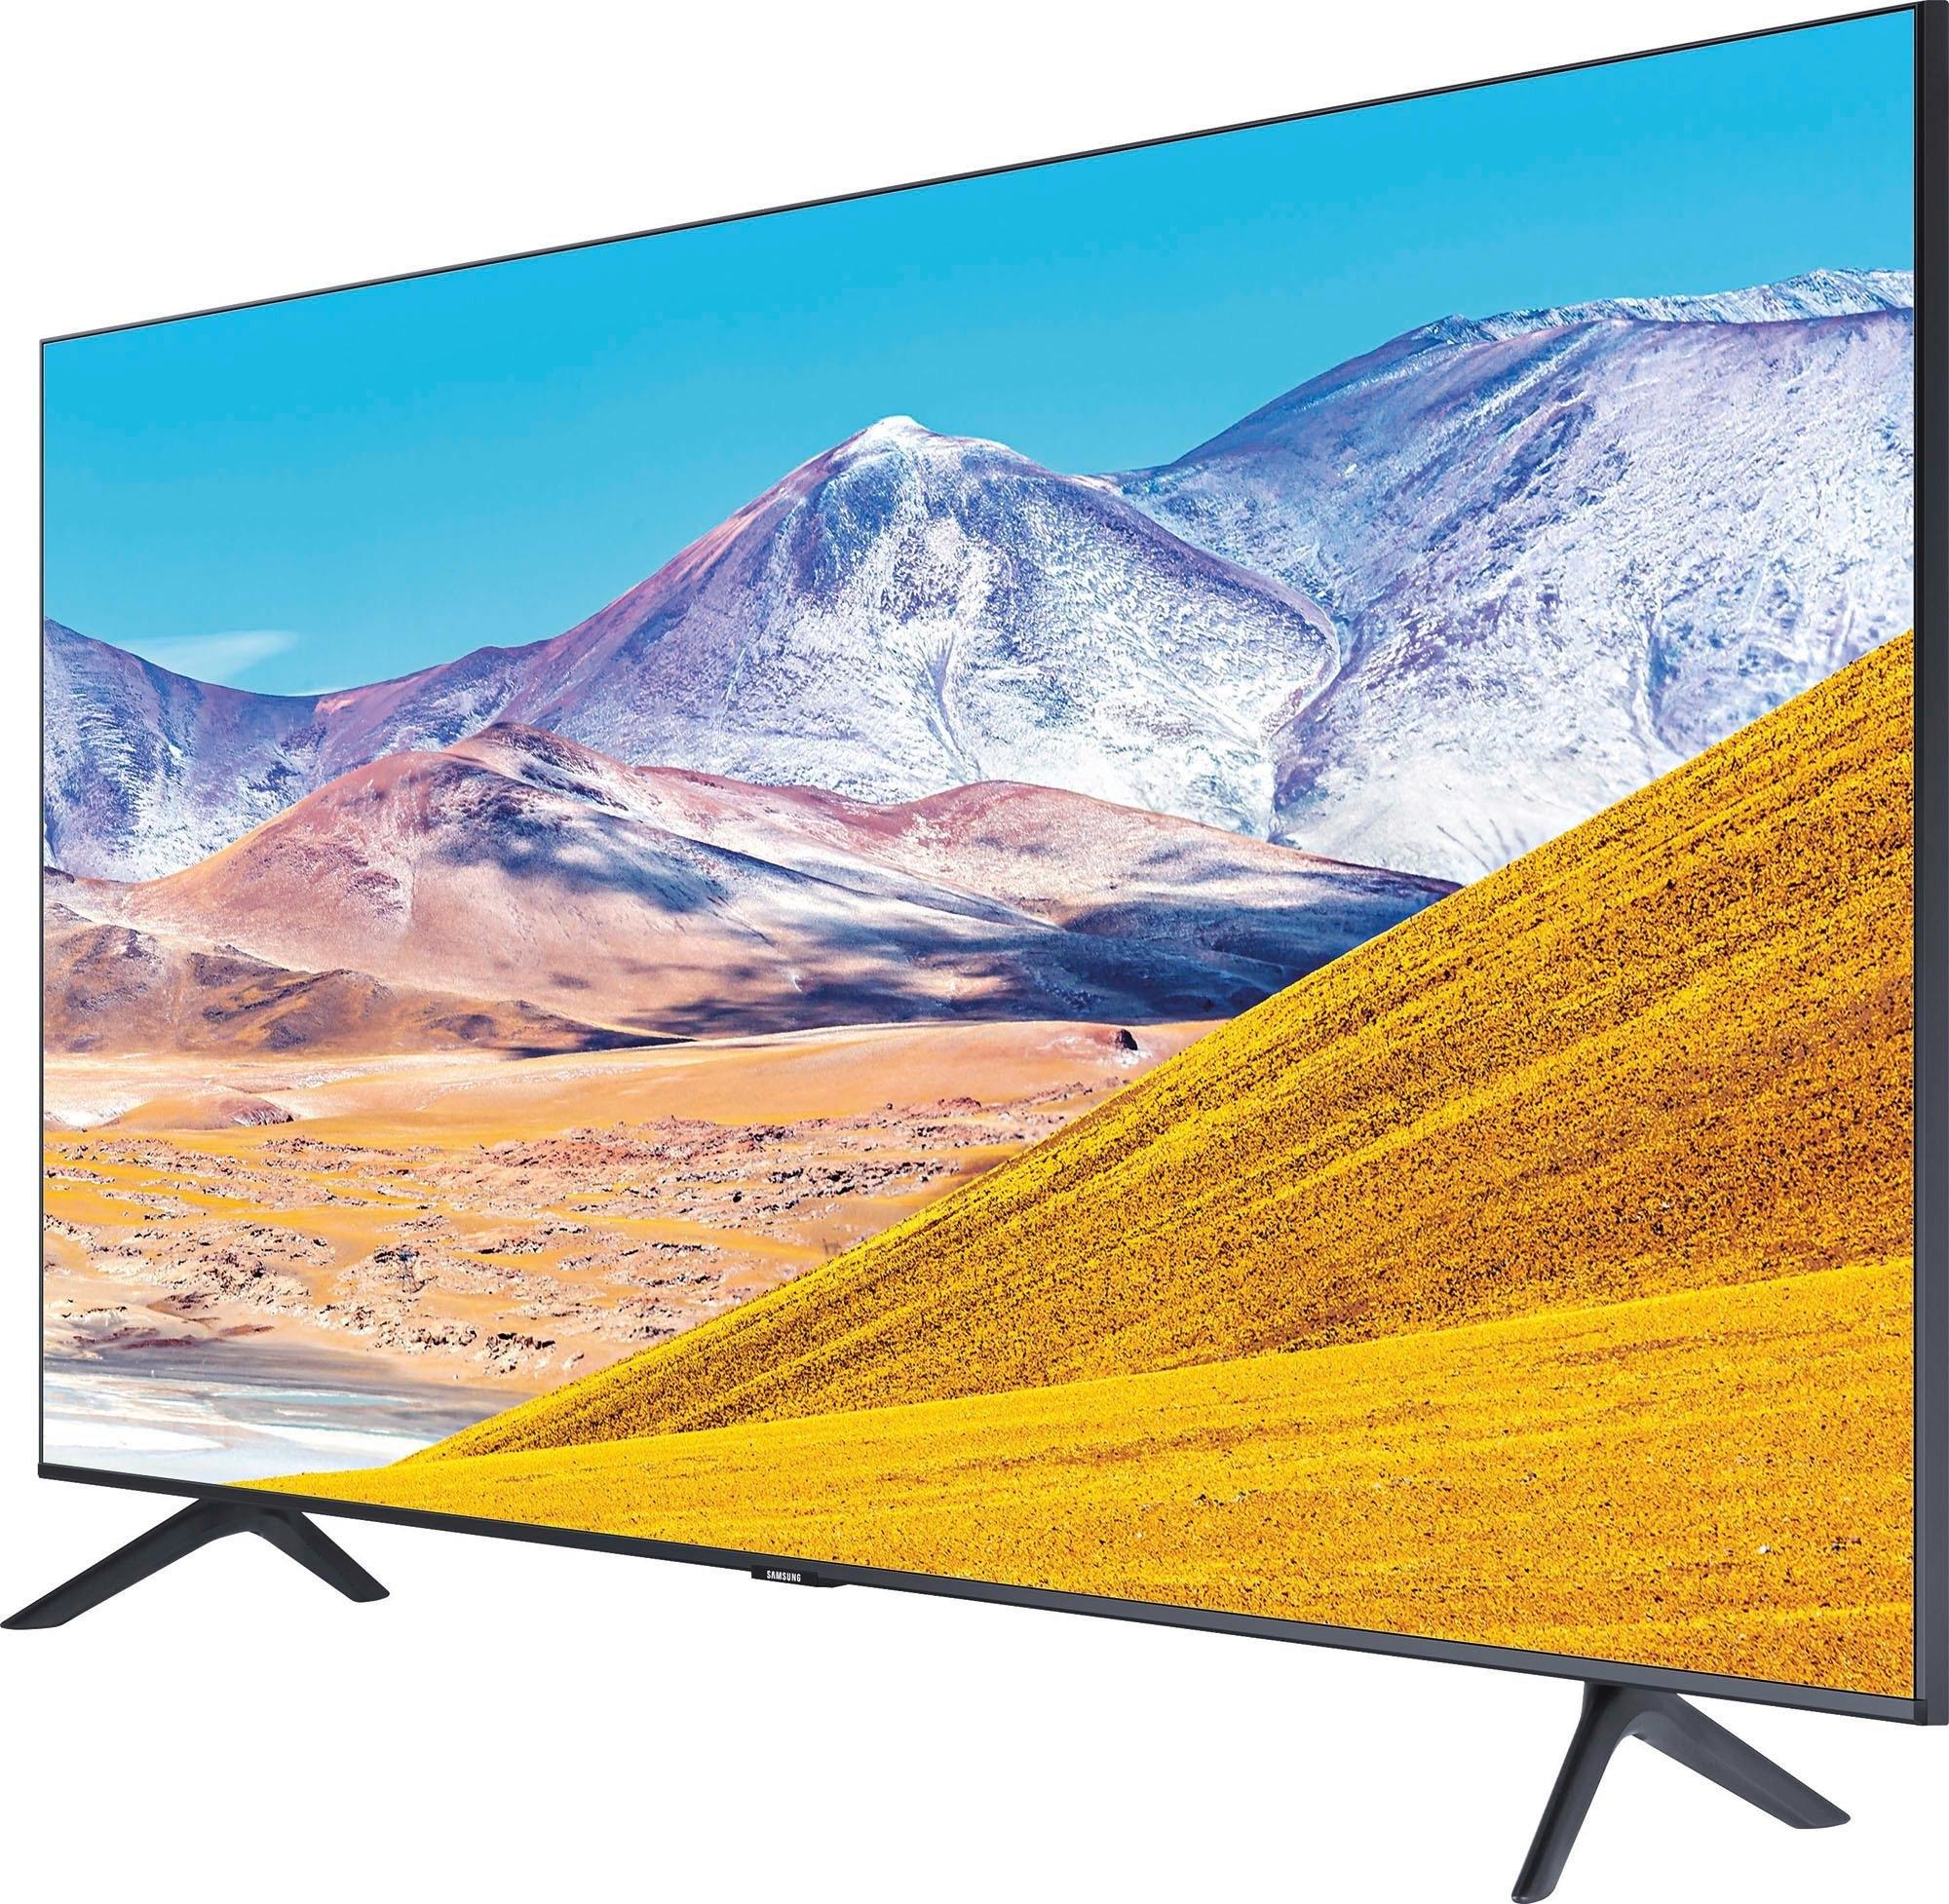 SAMSUNG »GU55TU8079« LED-TV in de webshop van OTTO kopen